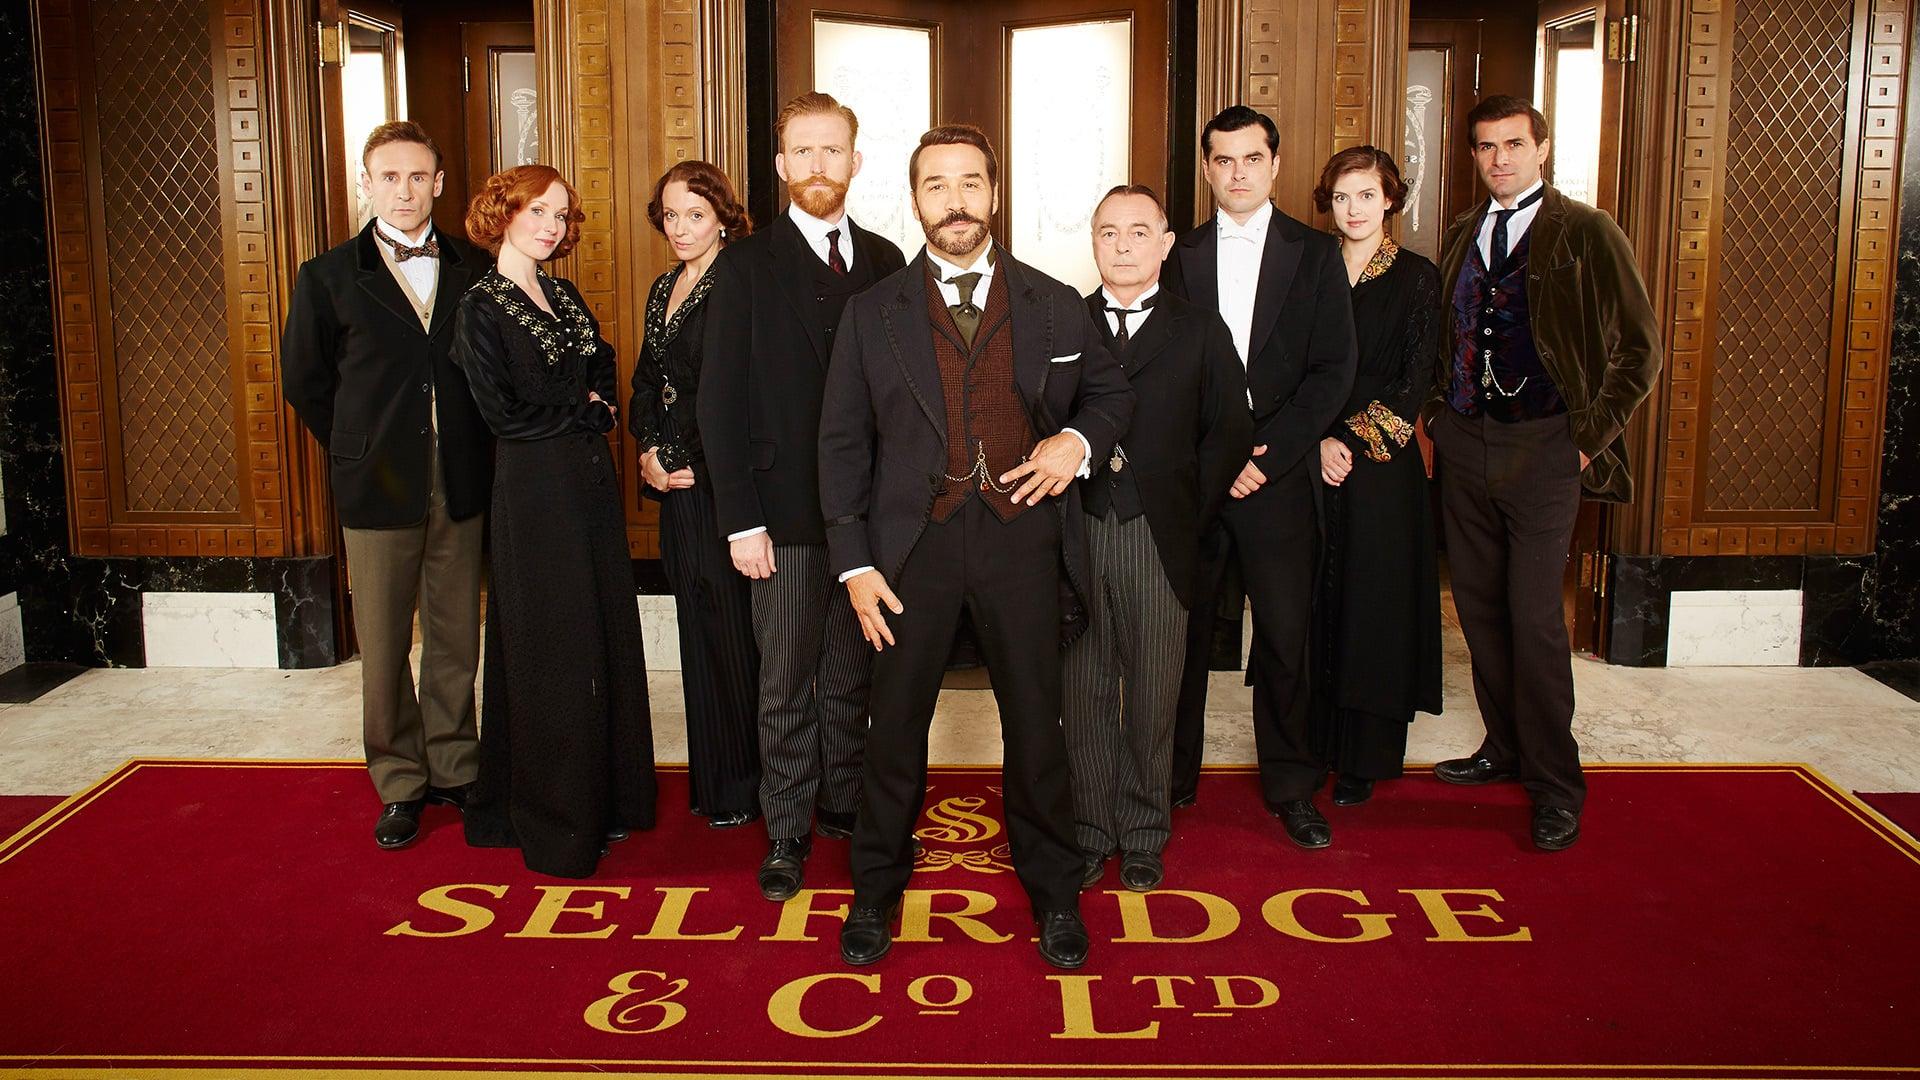 'Mr Selfridge' renewed for third season